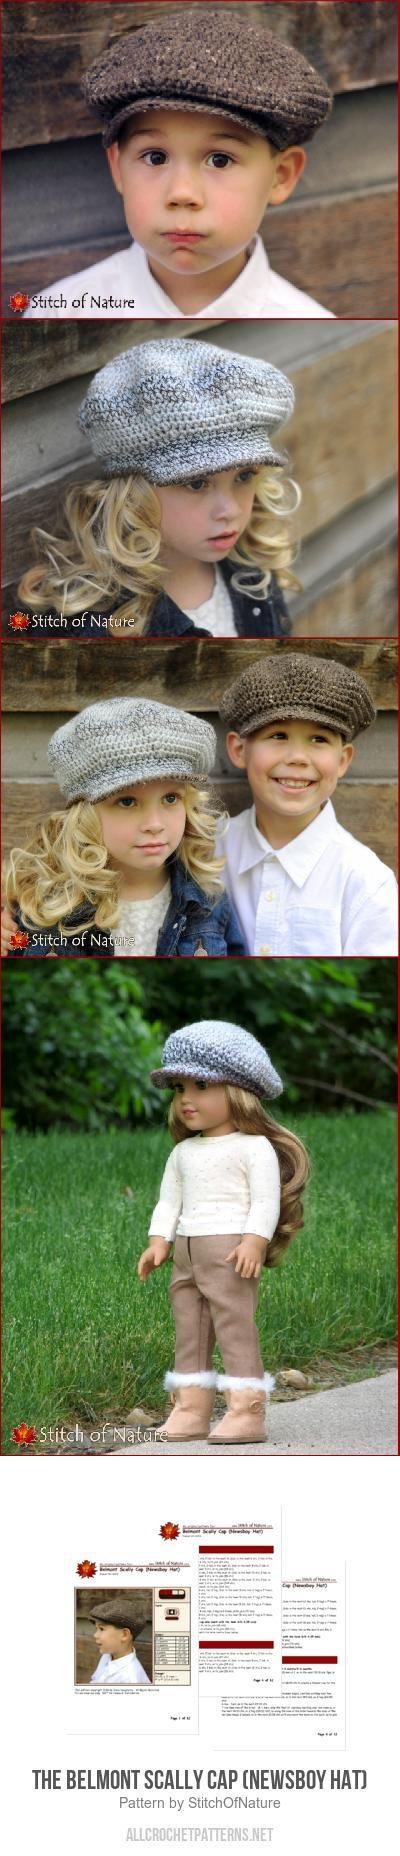 6e1ef5bf67 The Belmont Scally Cap (Newsboy Hat) crochet pattern by Stitch of ...